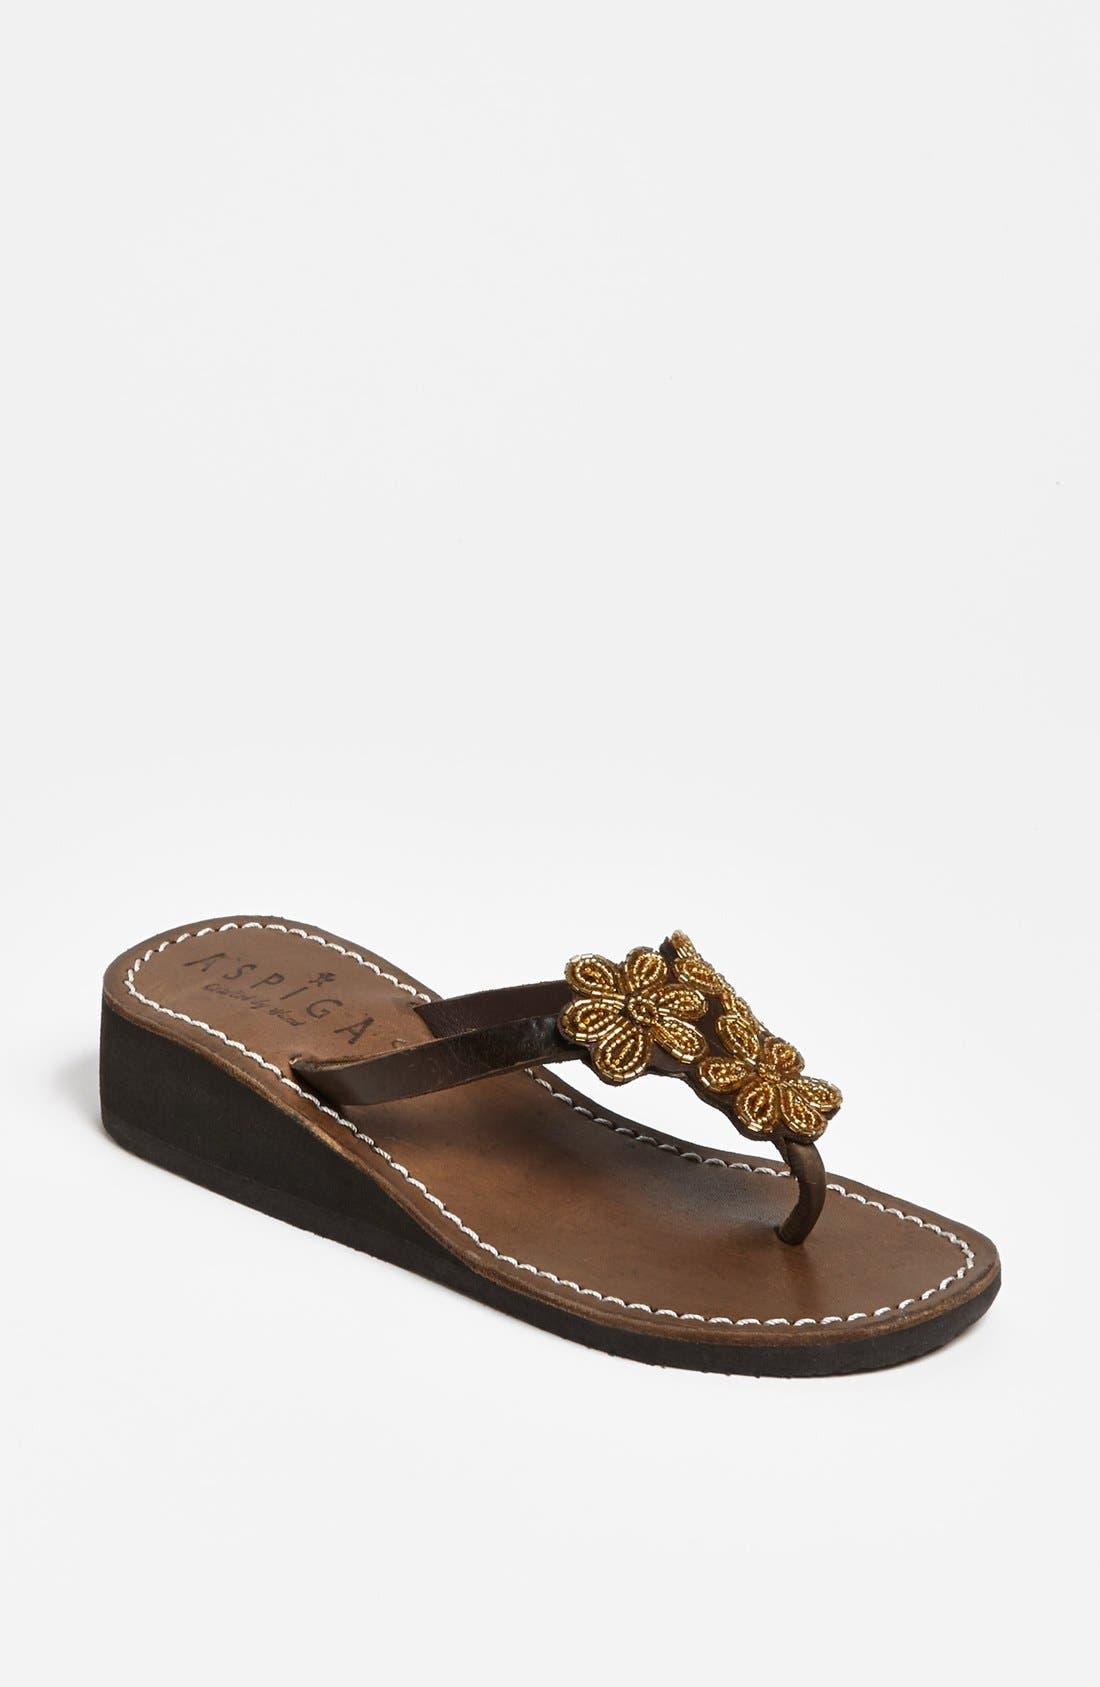 Main Image - Aspiga 'Minazi' Sandal